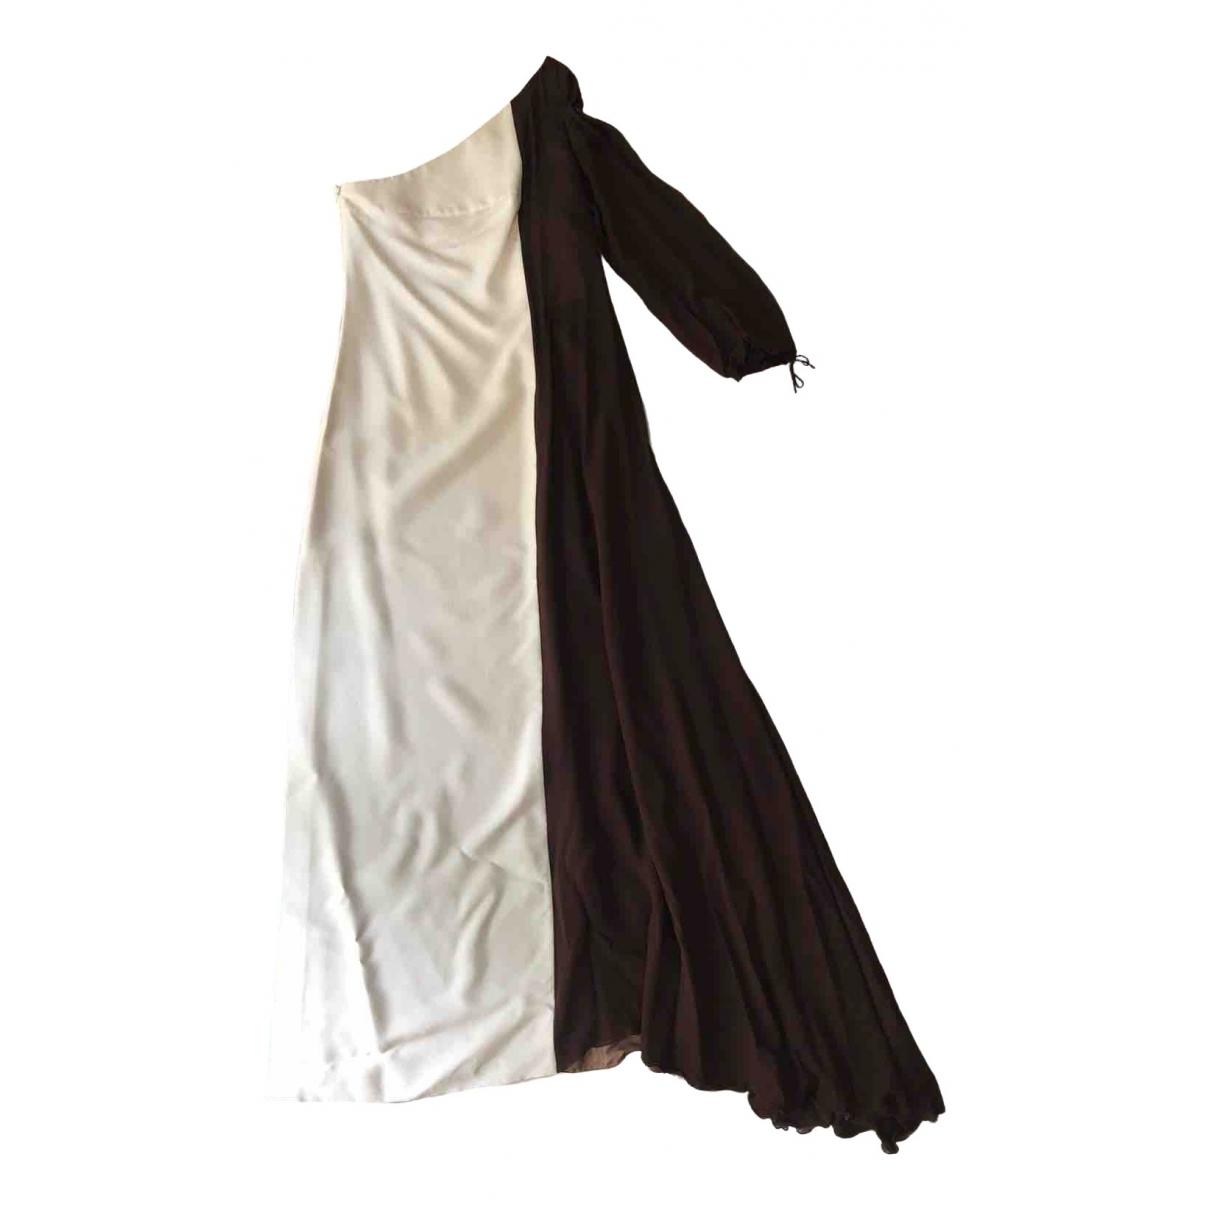 Barbara Bui - Robe   pour femme en soie - marron